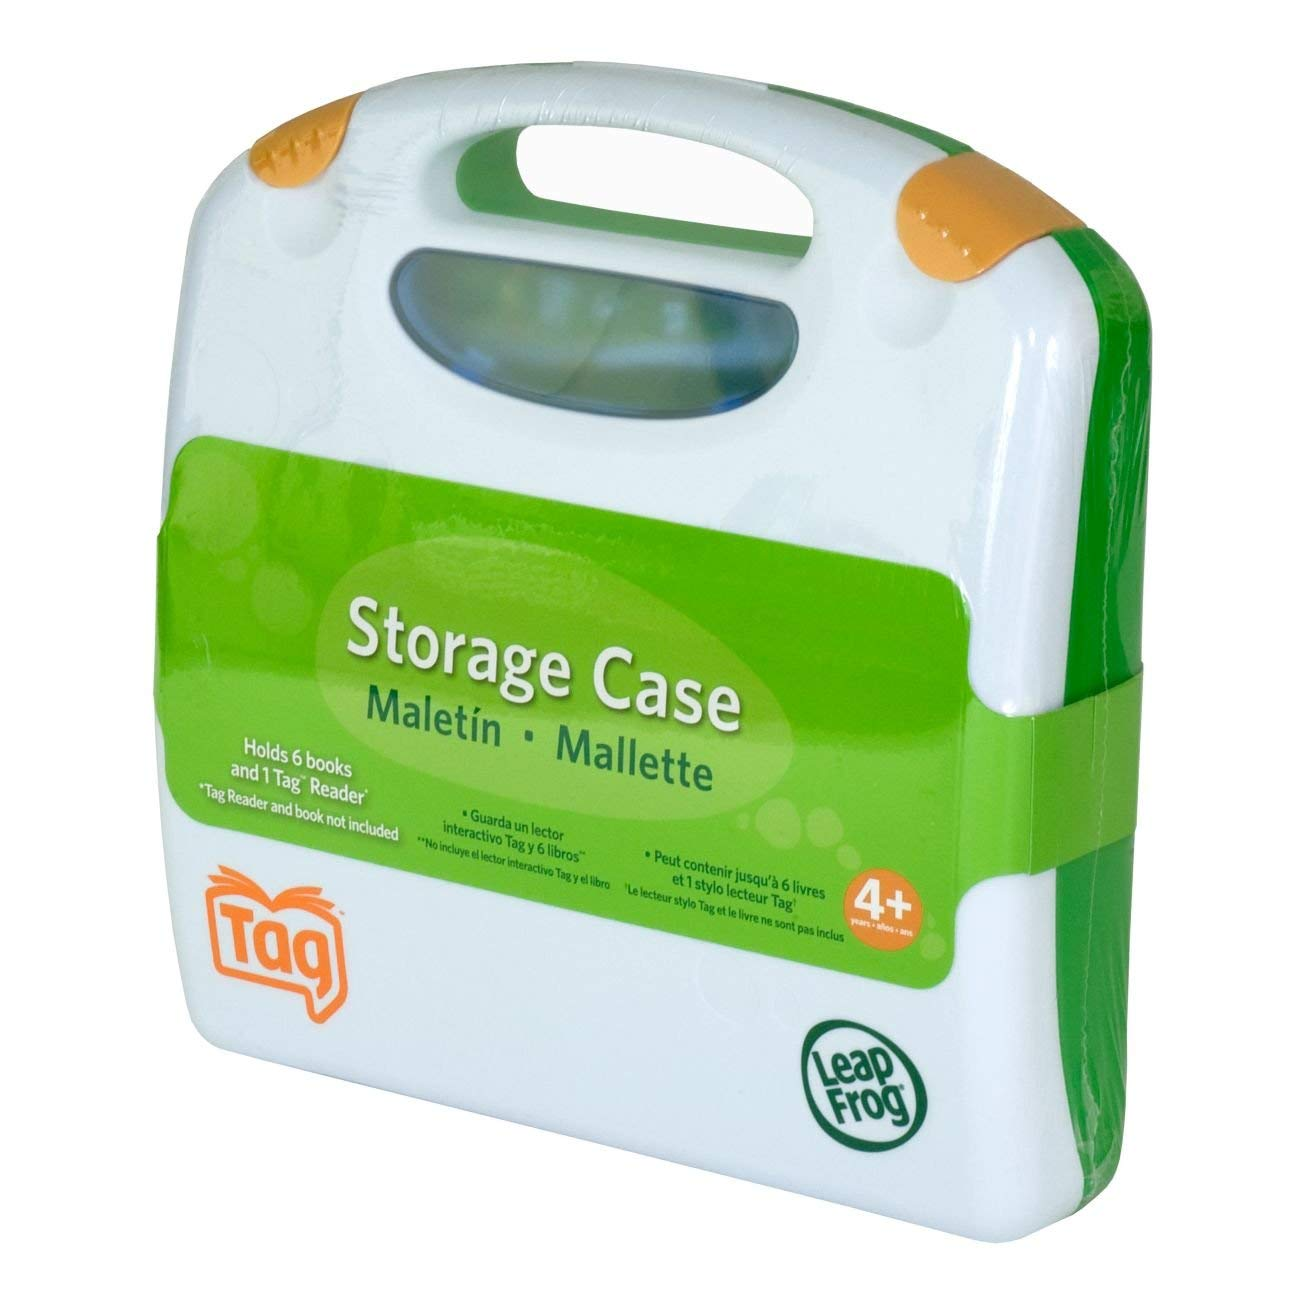 LeapFrog Tag Storage Case by LeapFrog